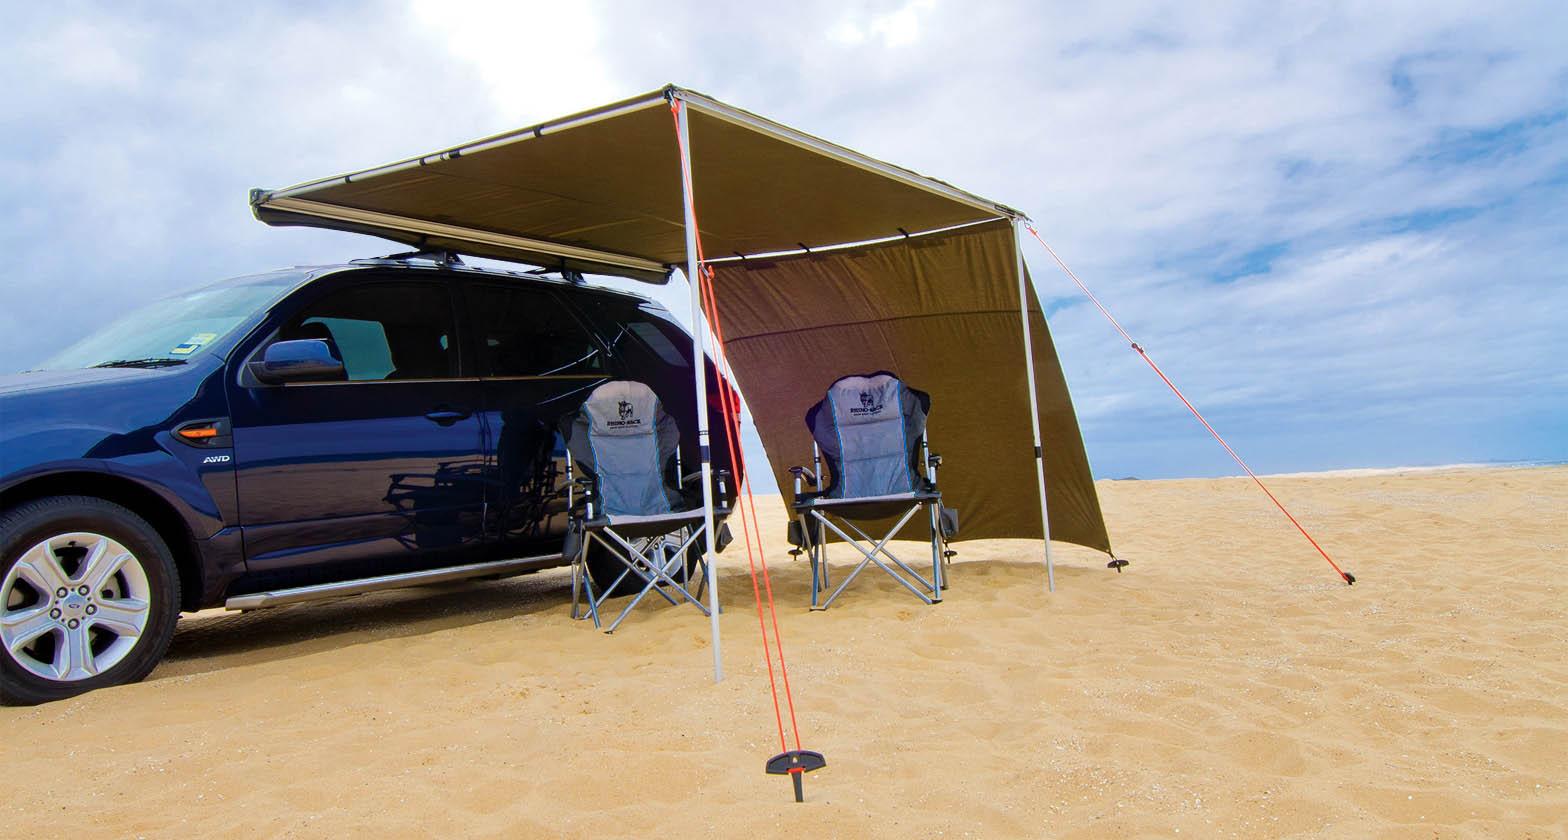 RhinoRack Sunseeker Awning Side Wall ライノラック サンシーカー オーニング サイドウォール 32112